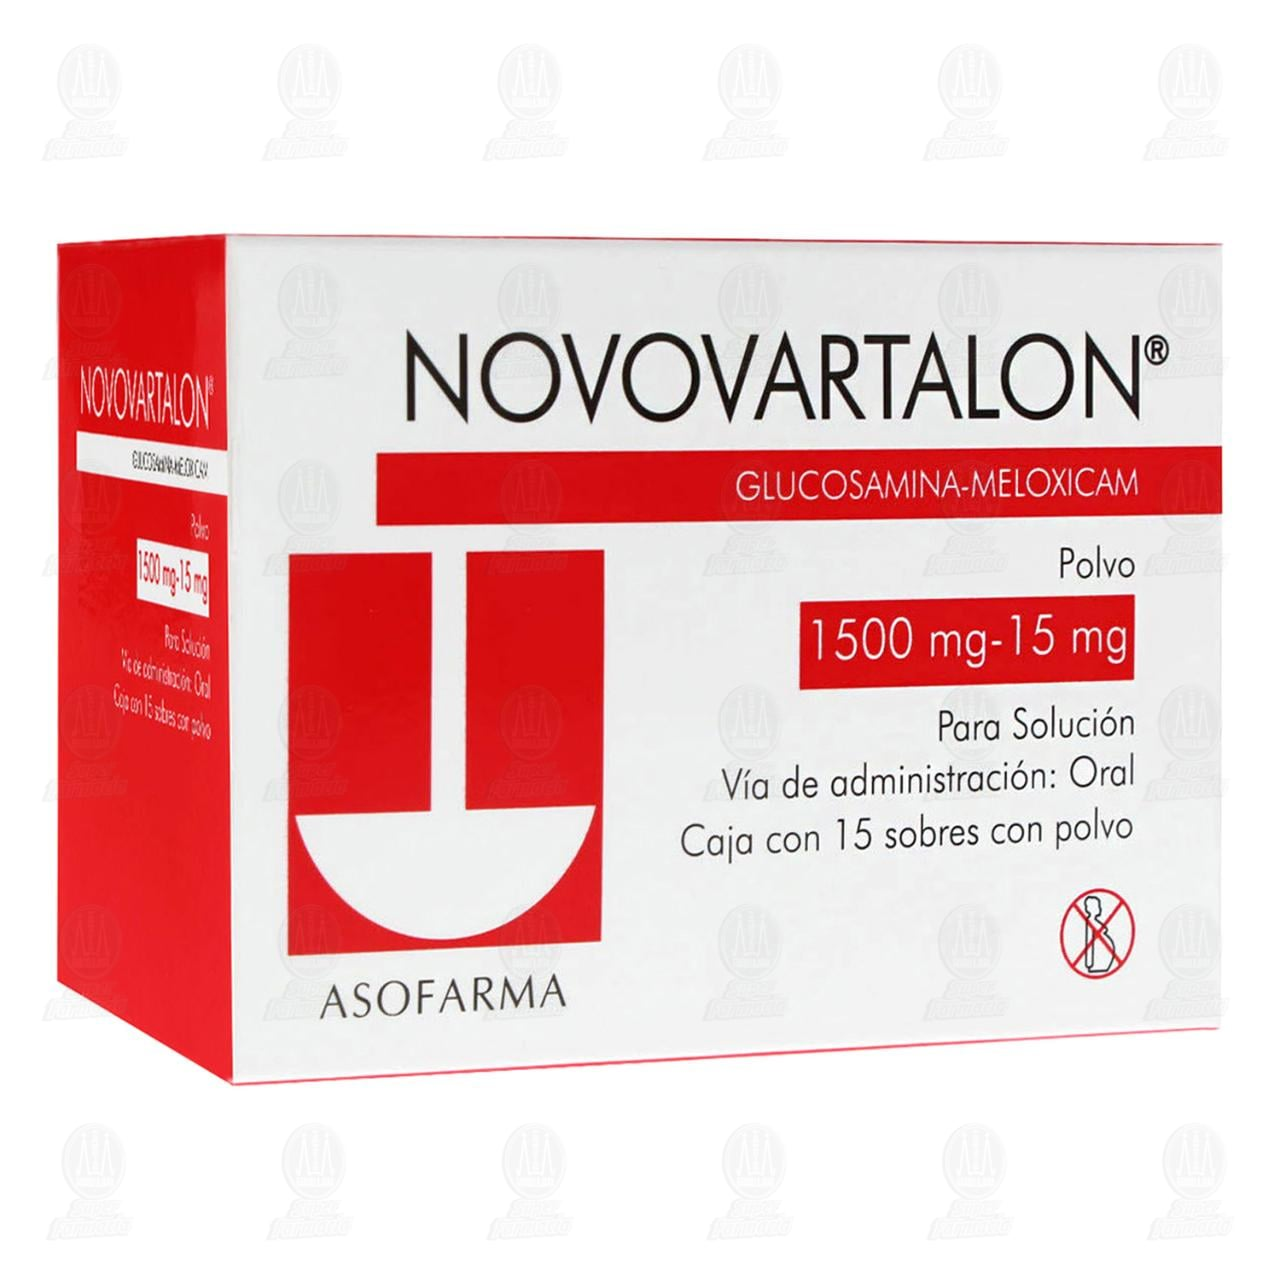 Comprar Novovartalon 1500mg/15mg 15 Sobres Polvo en Farmacias Guadalajara